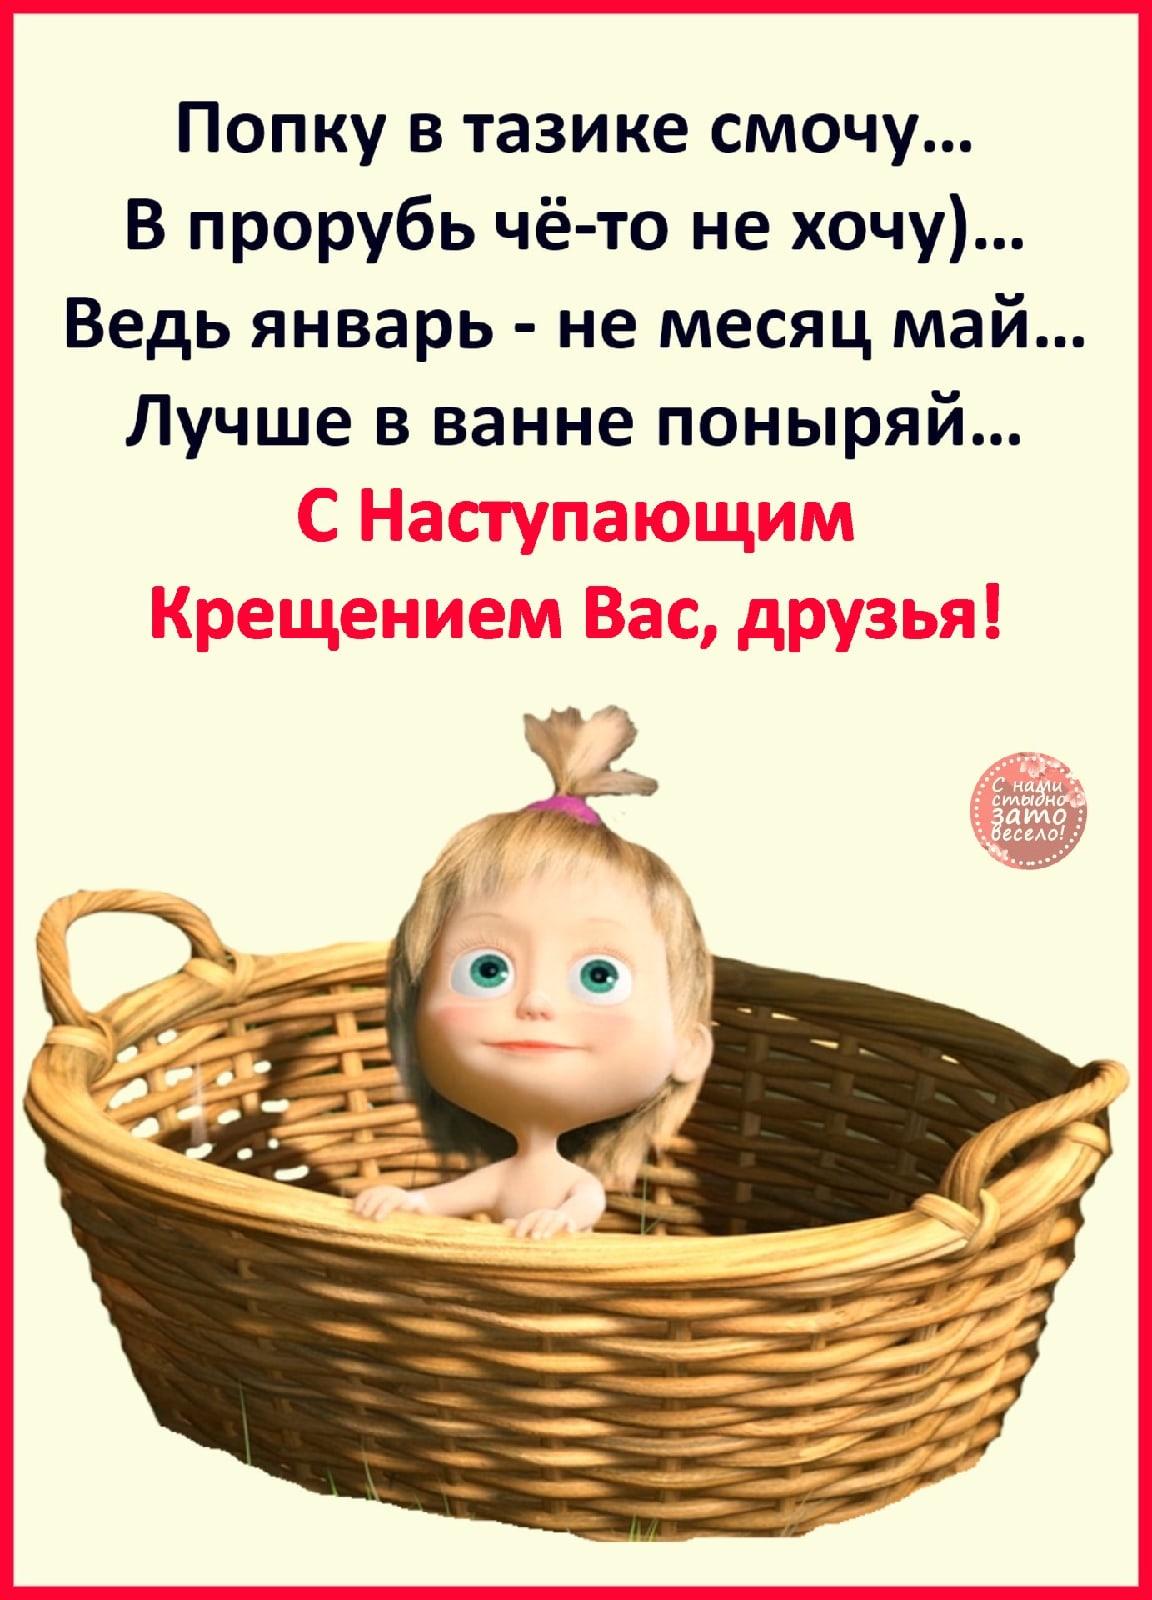 VeaCigkeuq0.jpg?size=1152x1600&quality=9